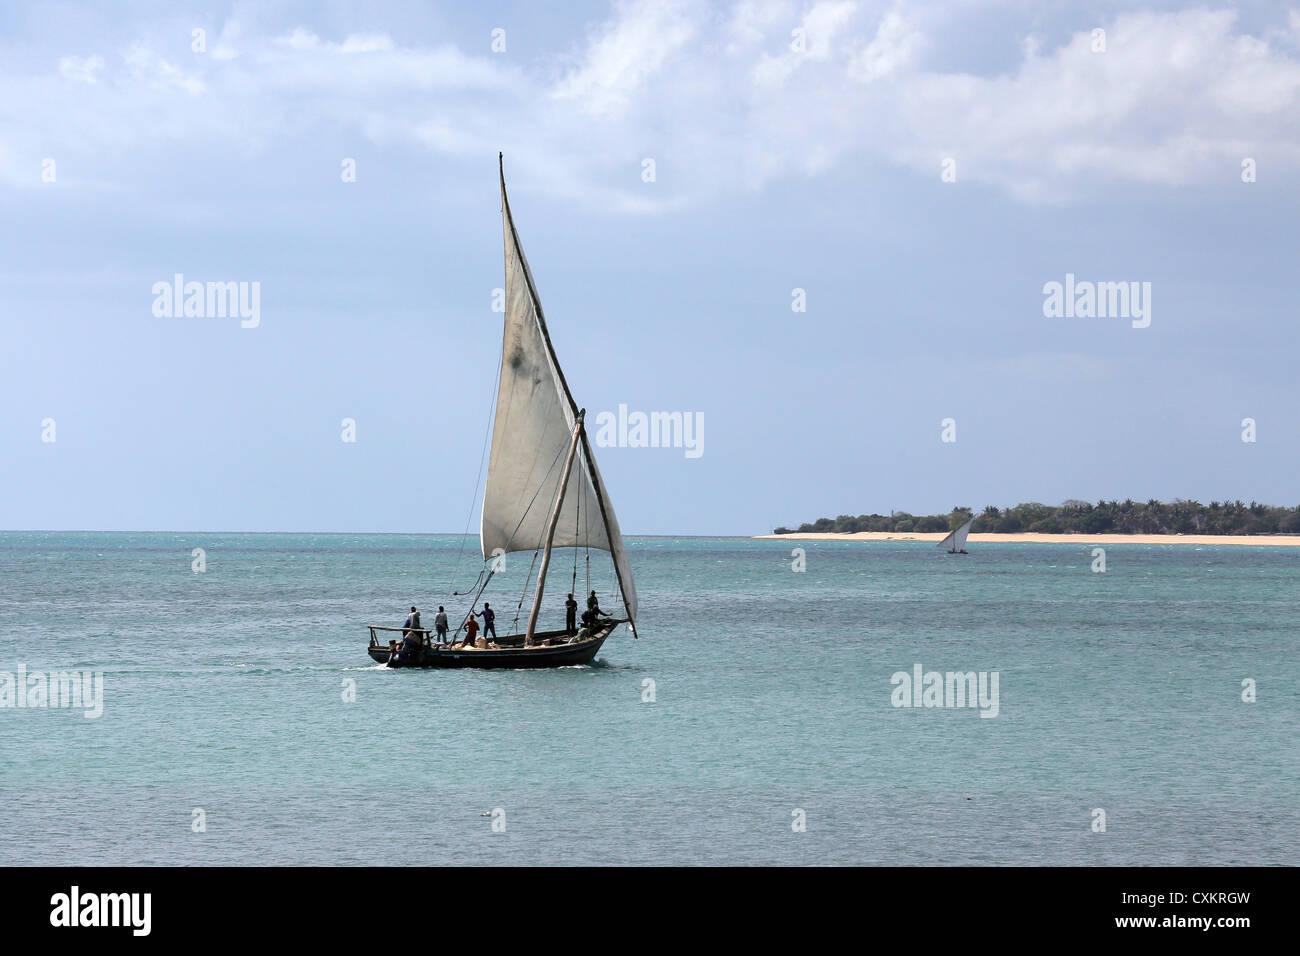 Arab sailing boat (dhow) off the Zanzibar Tanzanian coast - Stock Image